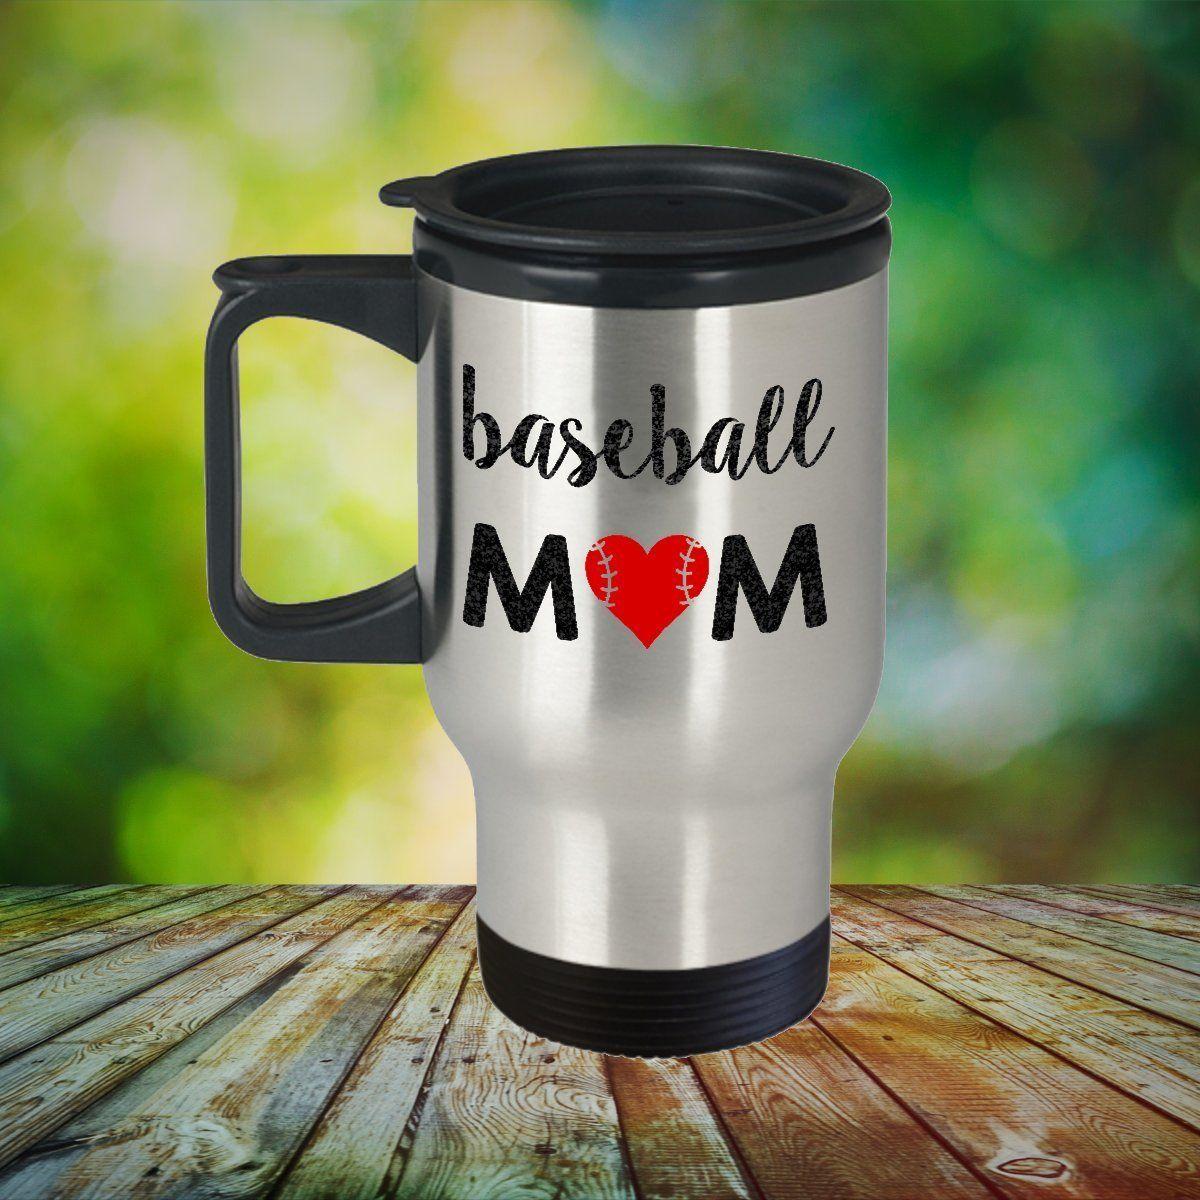 Baseball mom travel mug best and funny mothers